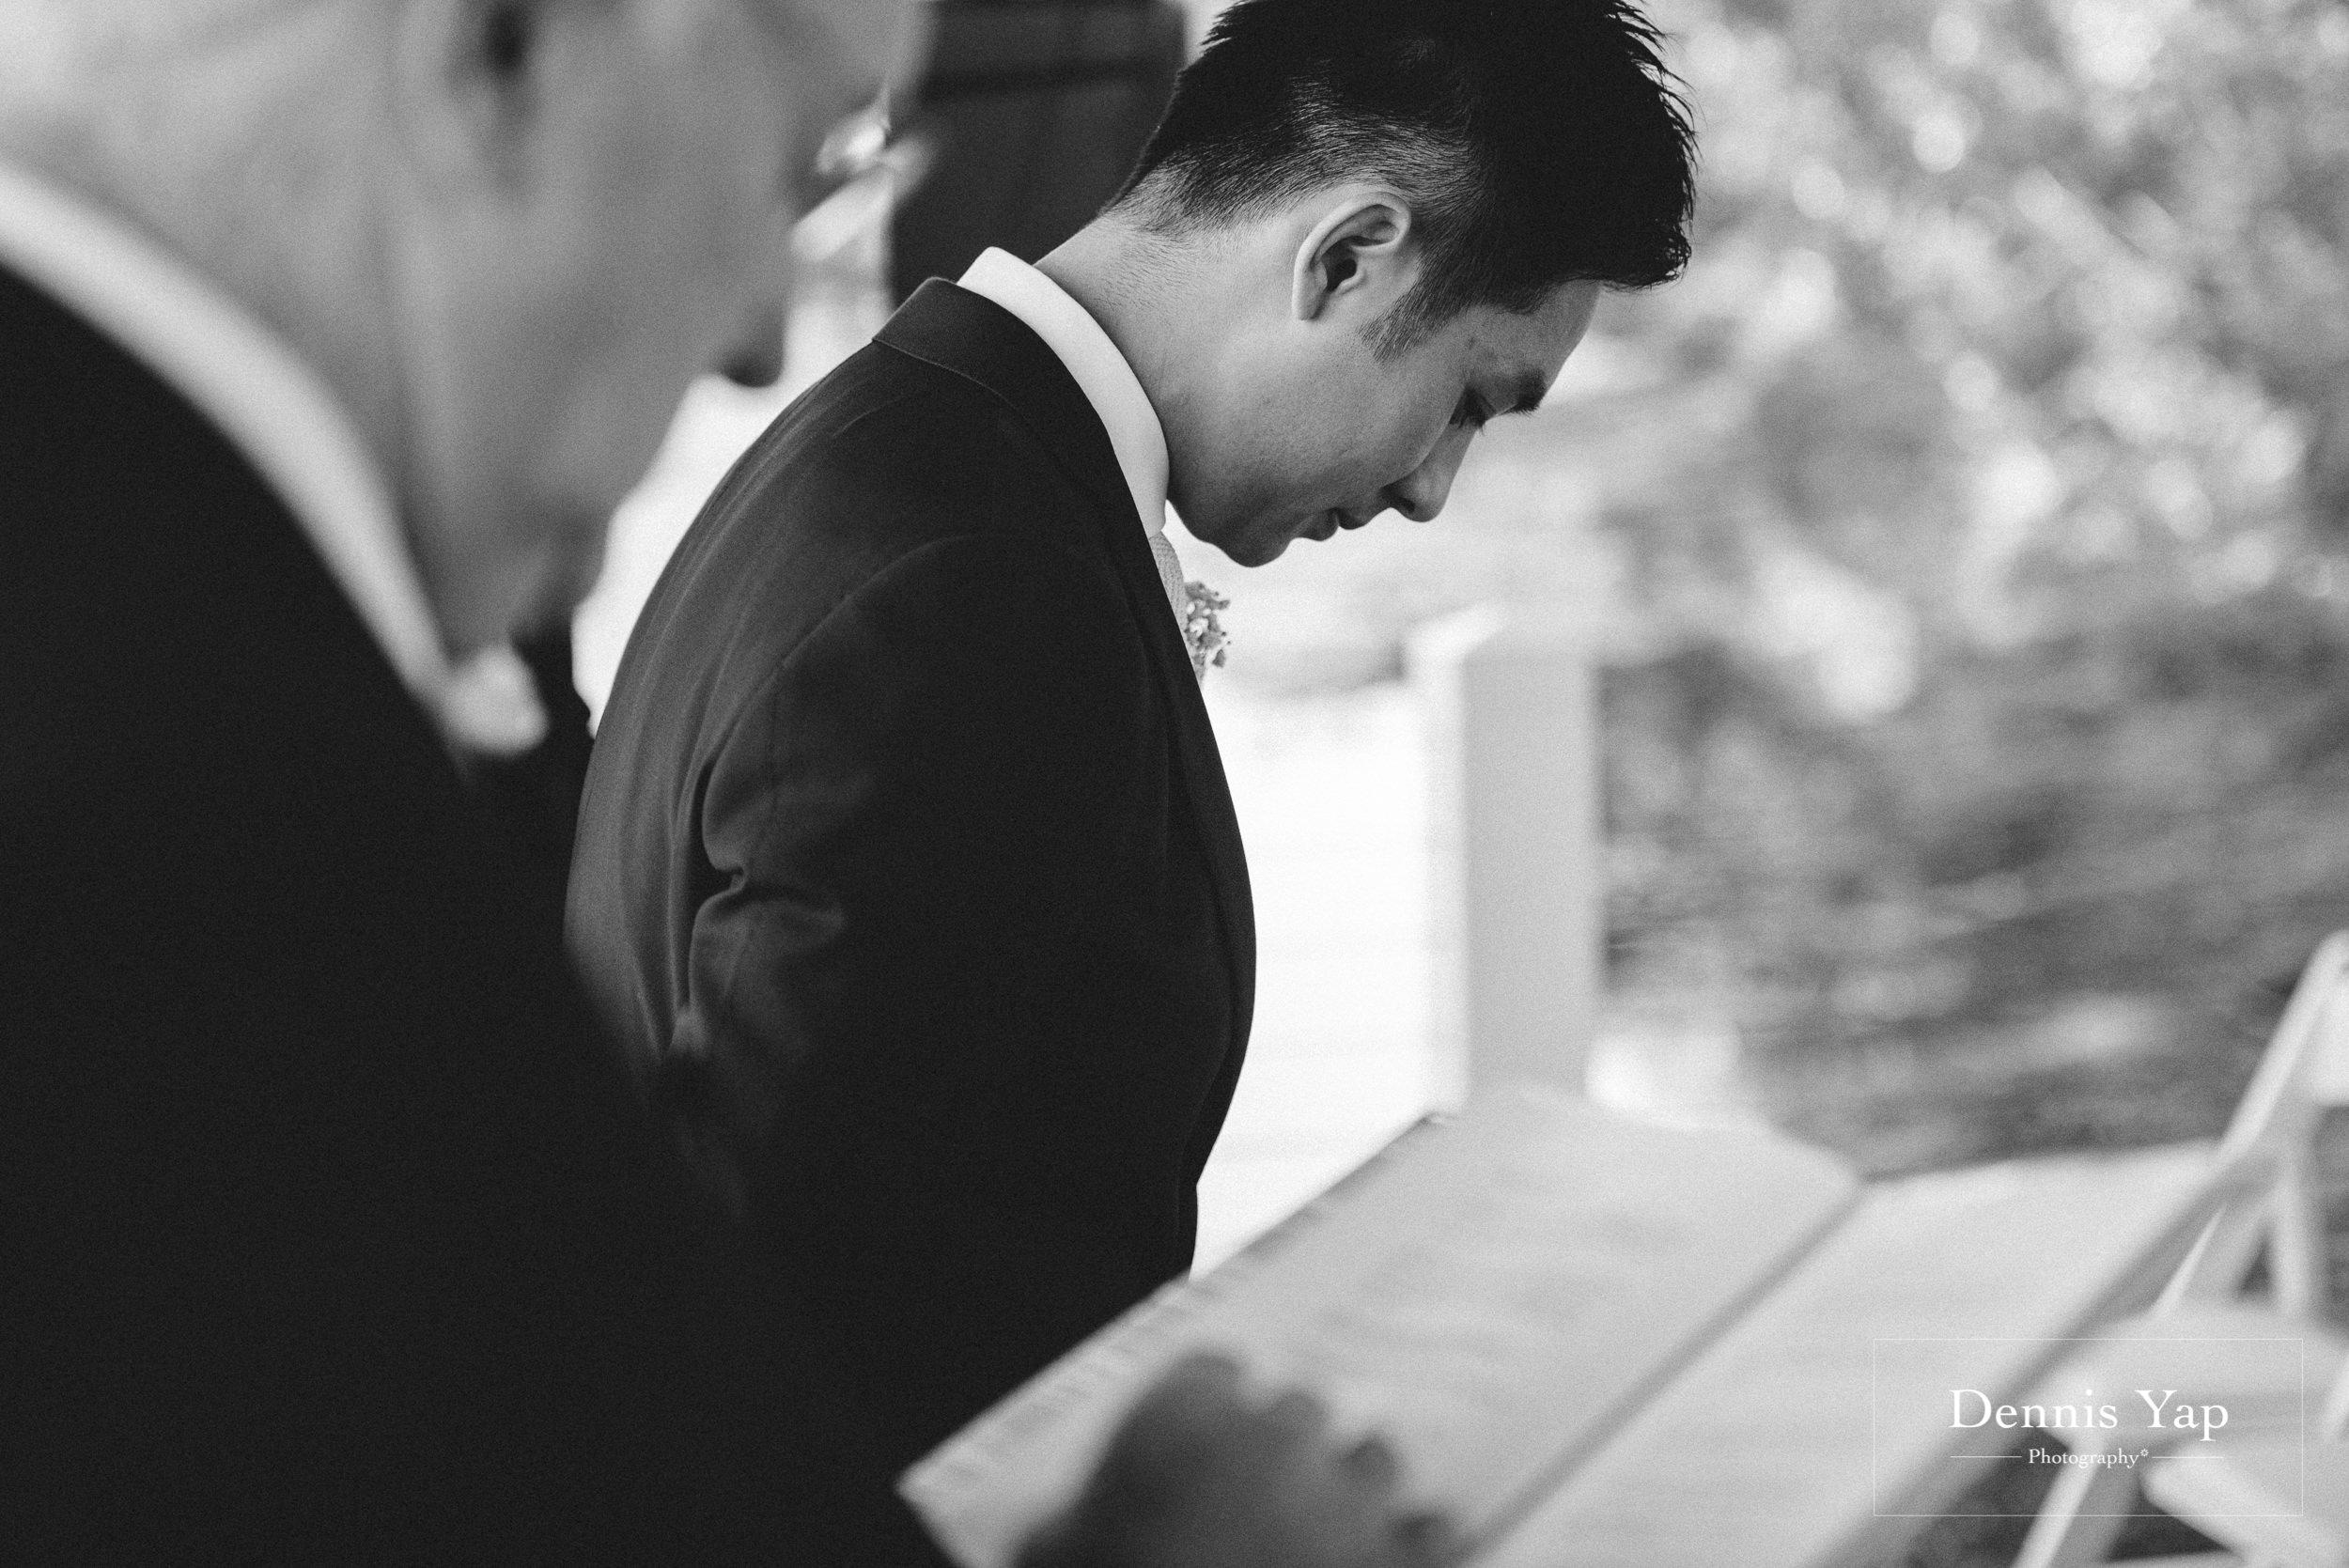 thang veng vietnamese wedding brisbane dennis yap photography malaysia wedding photographer-20.jpg